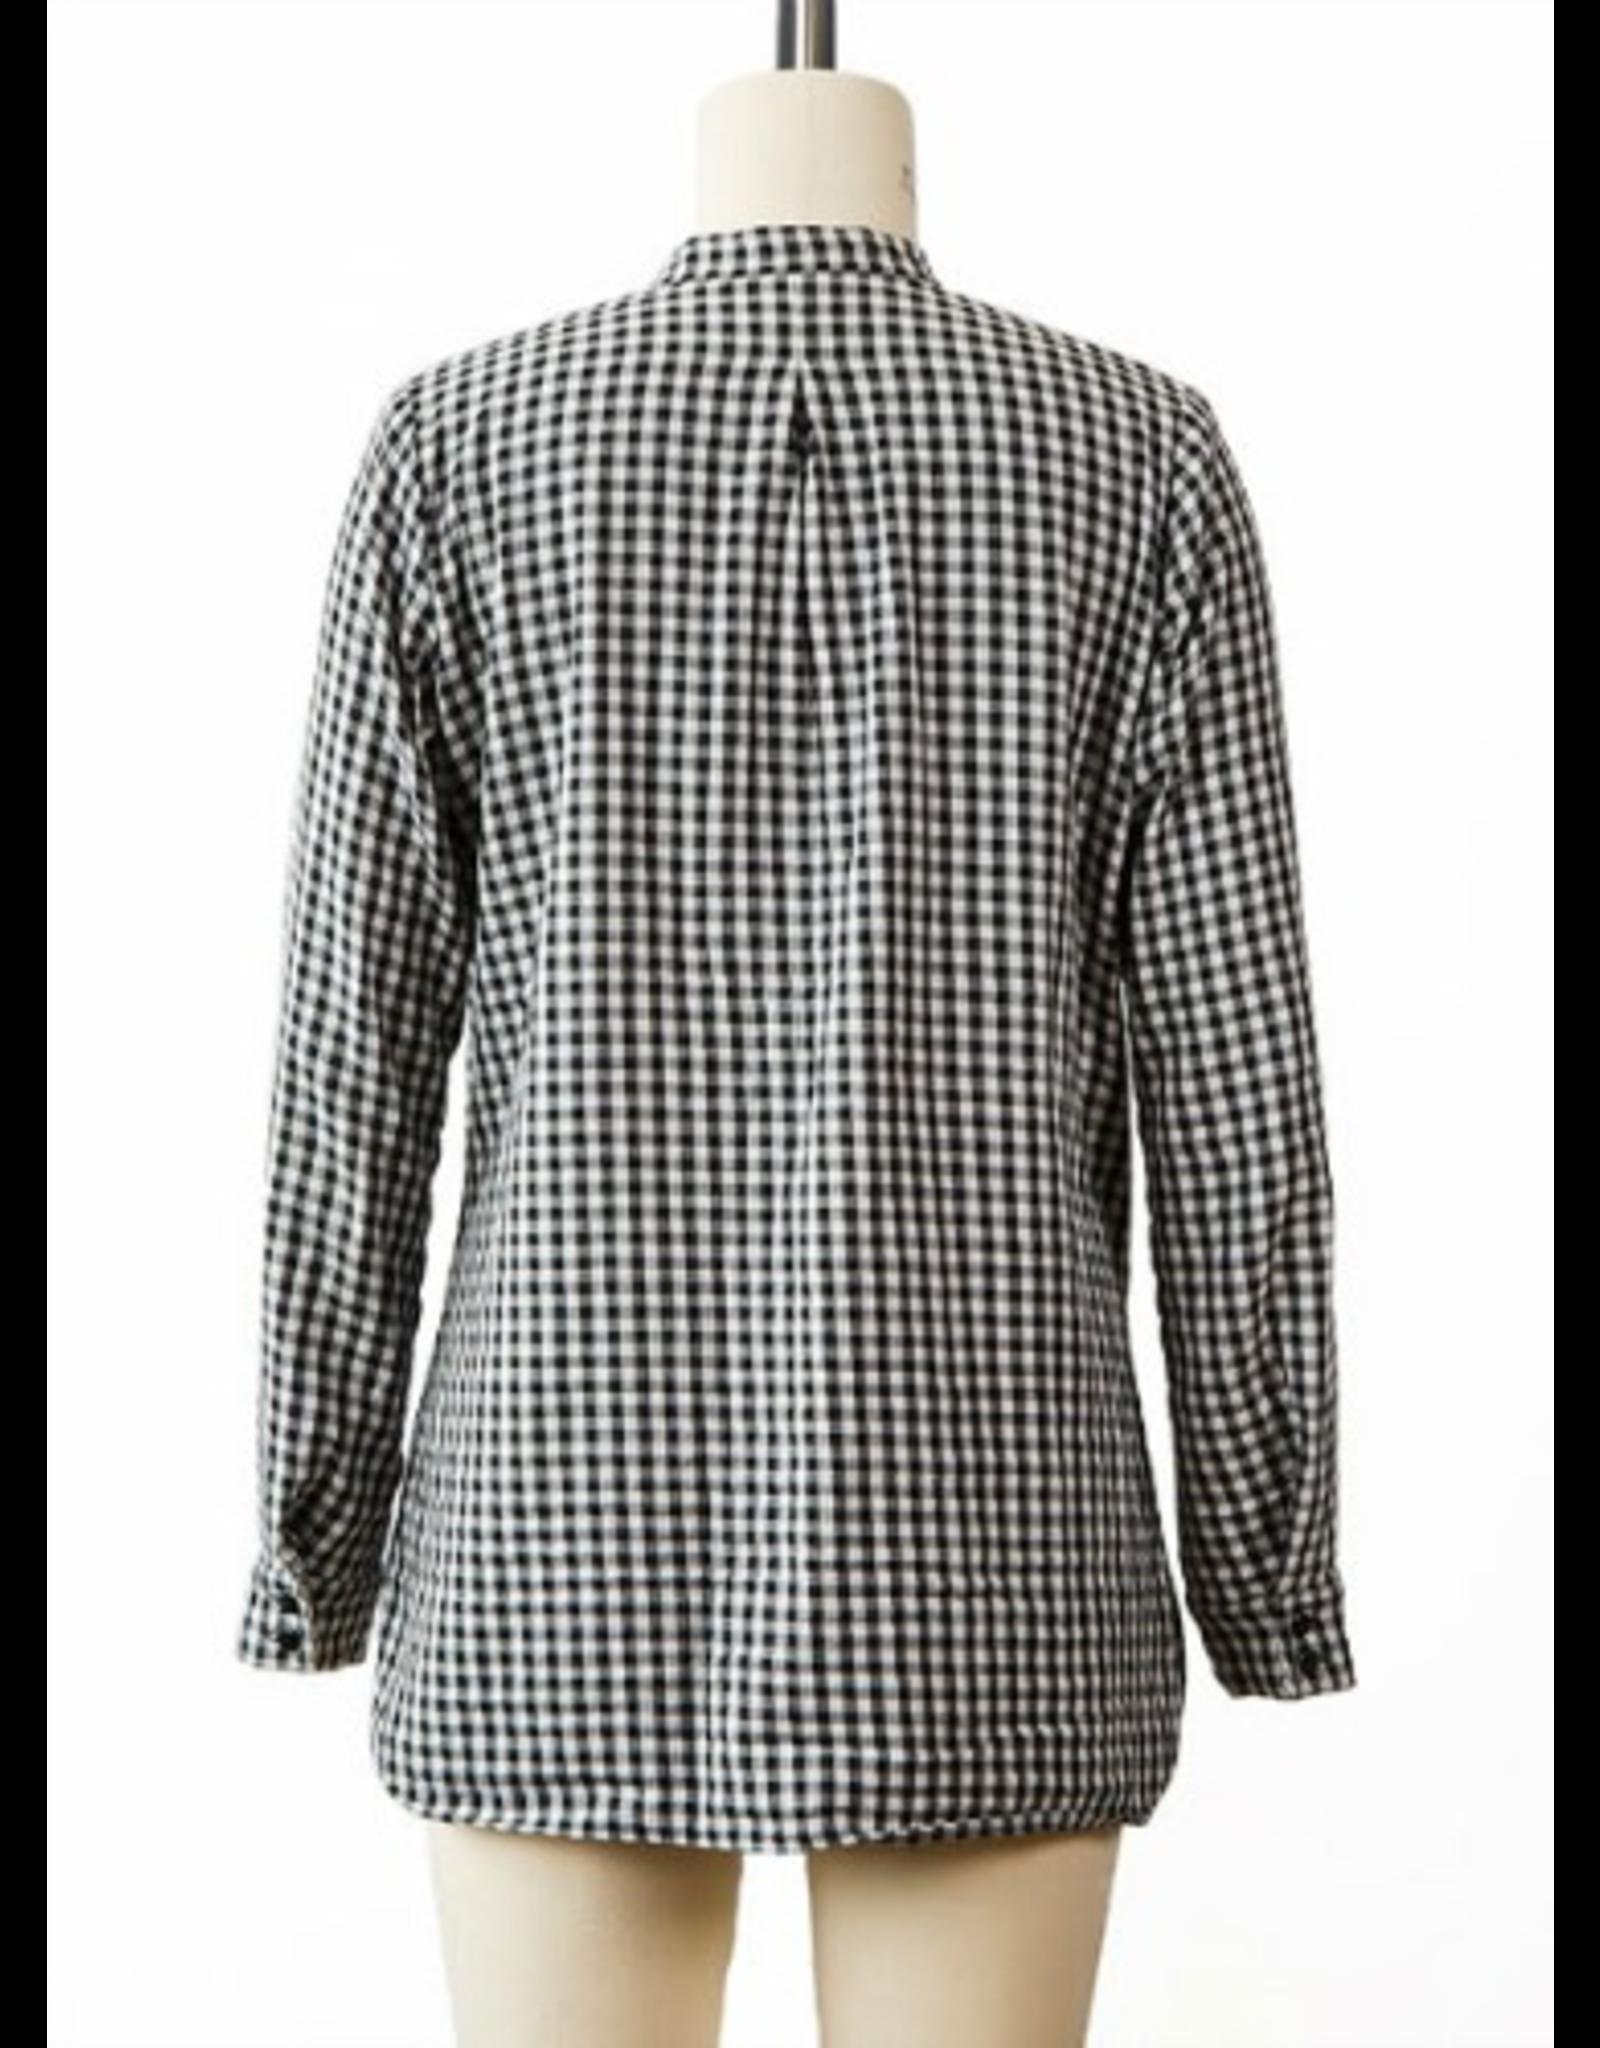 Liesl+Co. Gallery Tunic + Dress Pattern